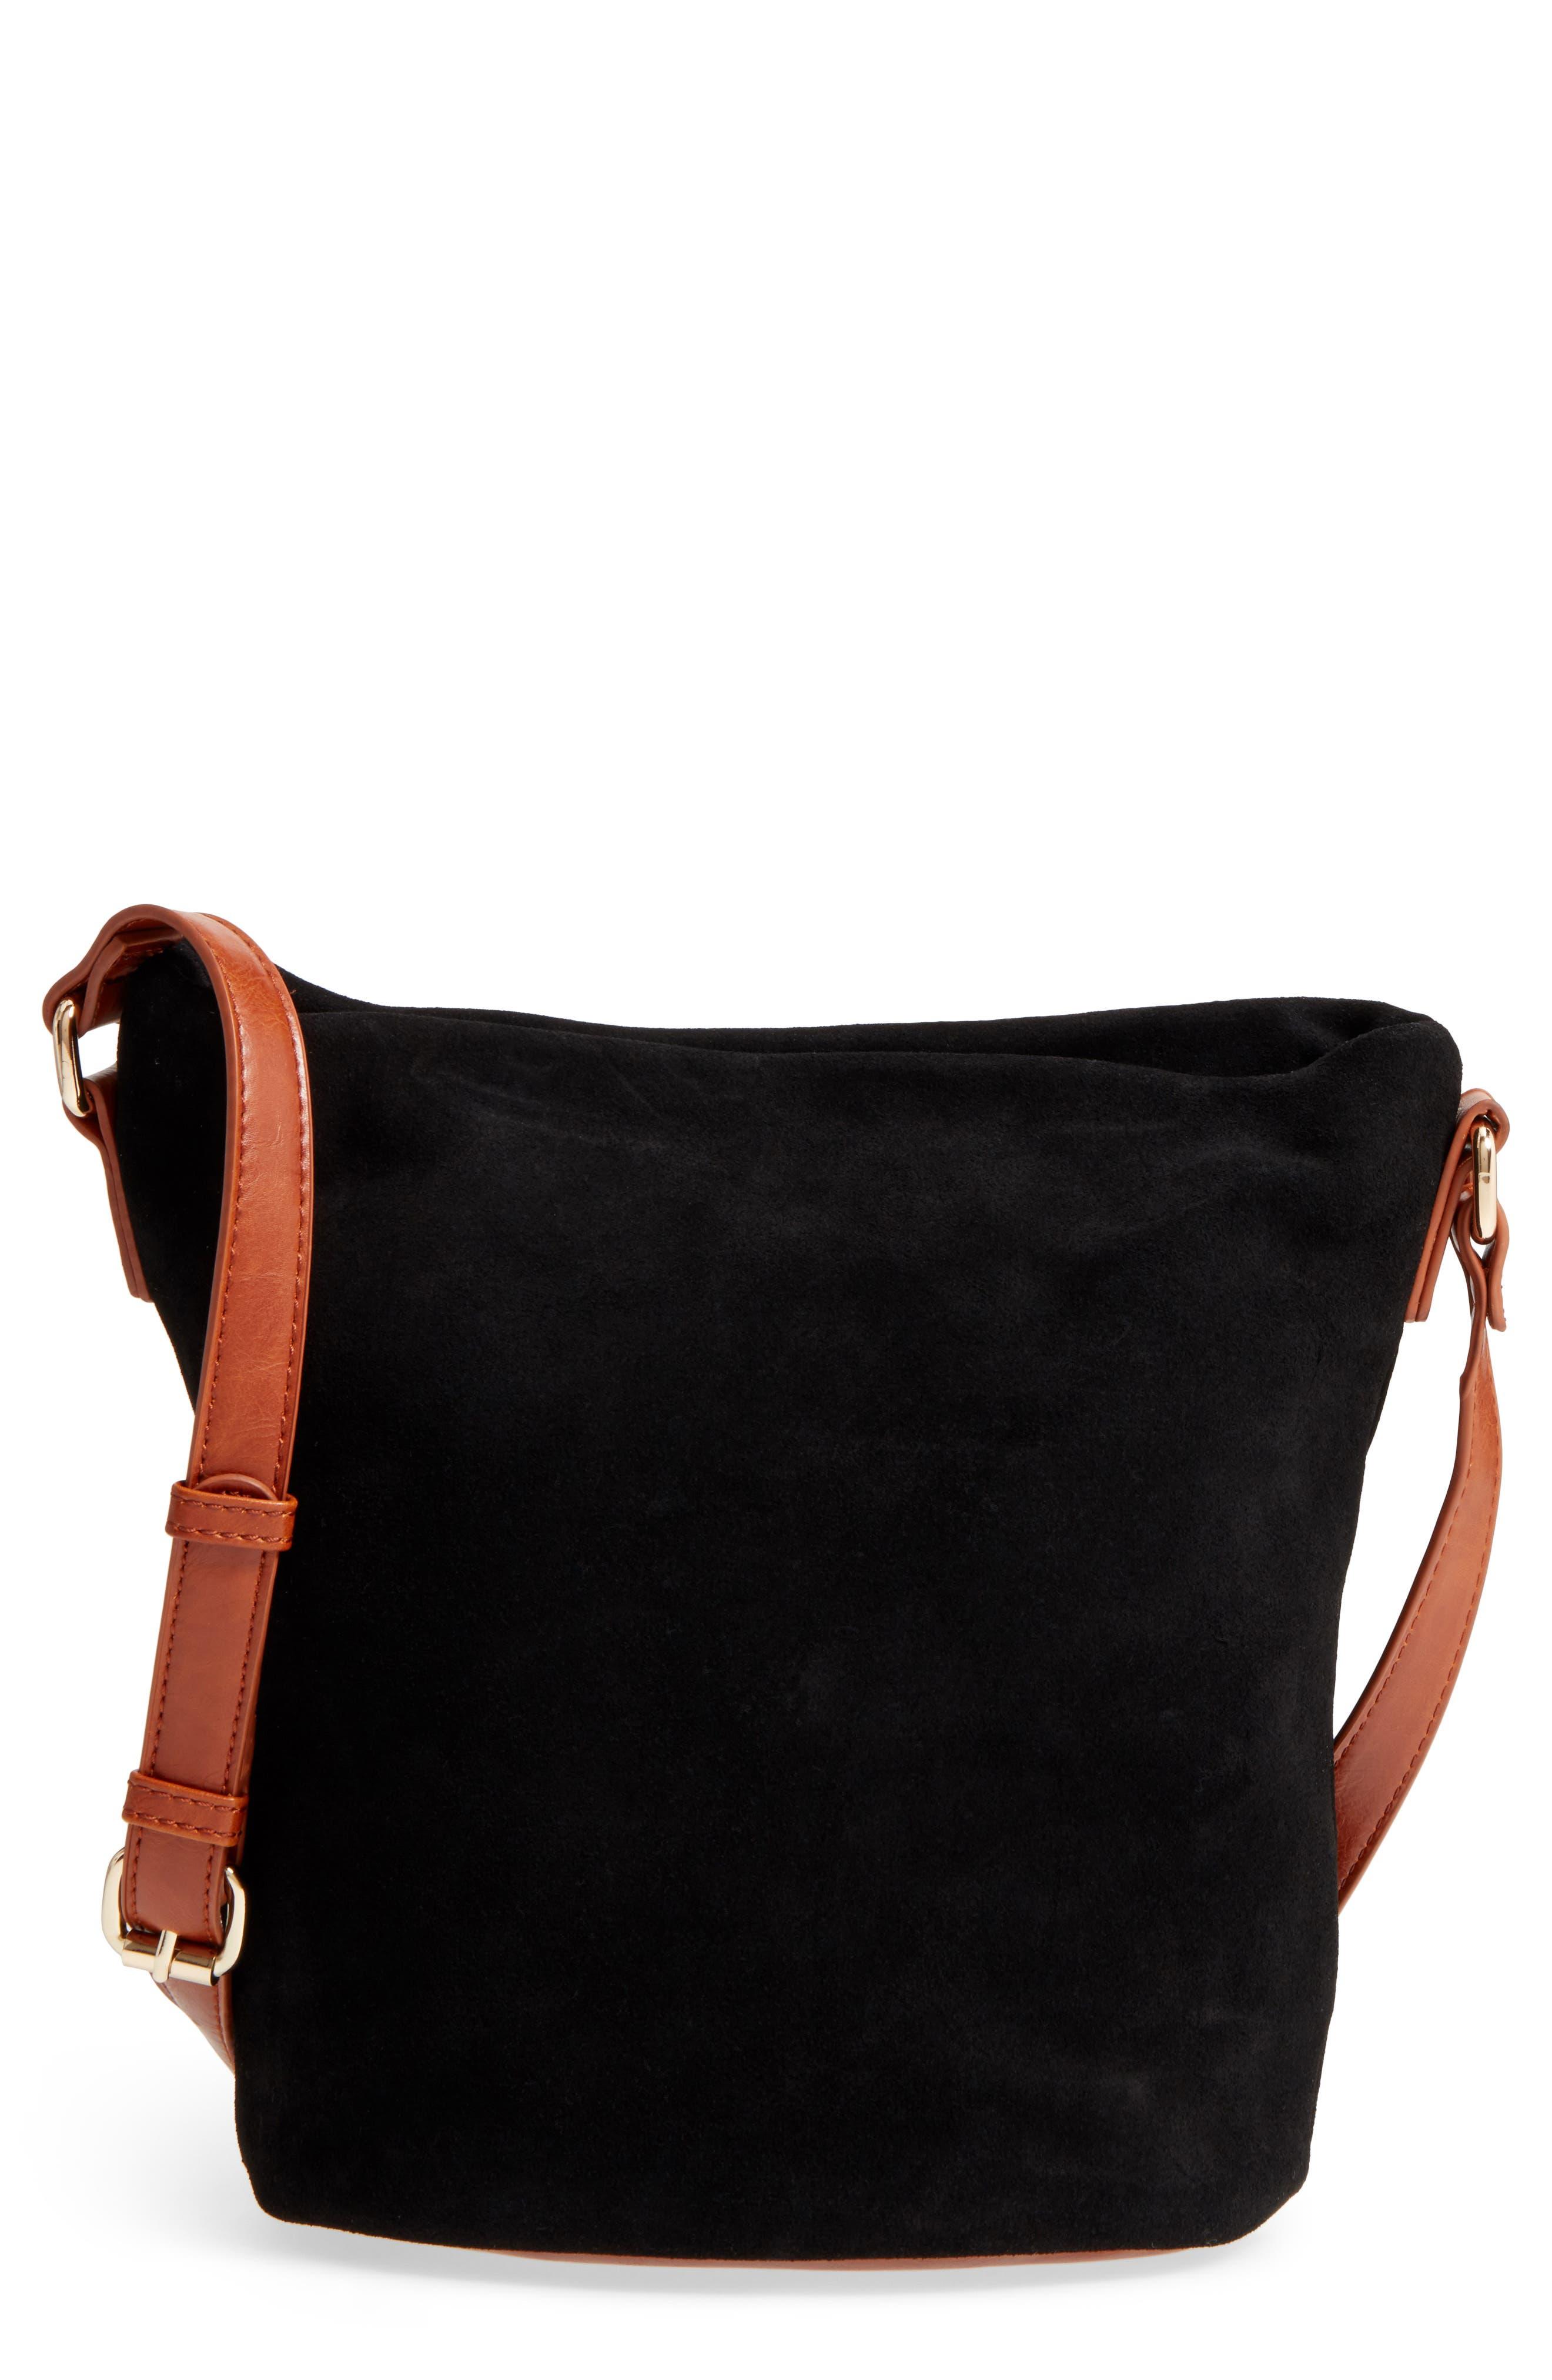 Lana Slouchy Suede Crossbody Bag,                             Main thumbnail 1, color,                             Black Cognac